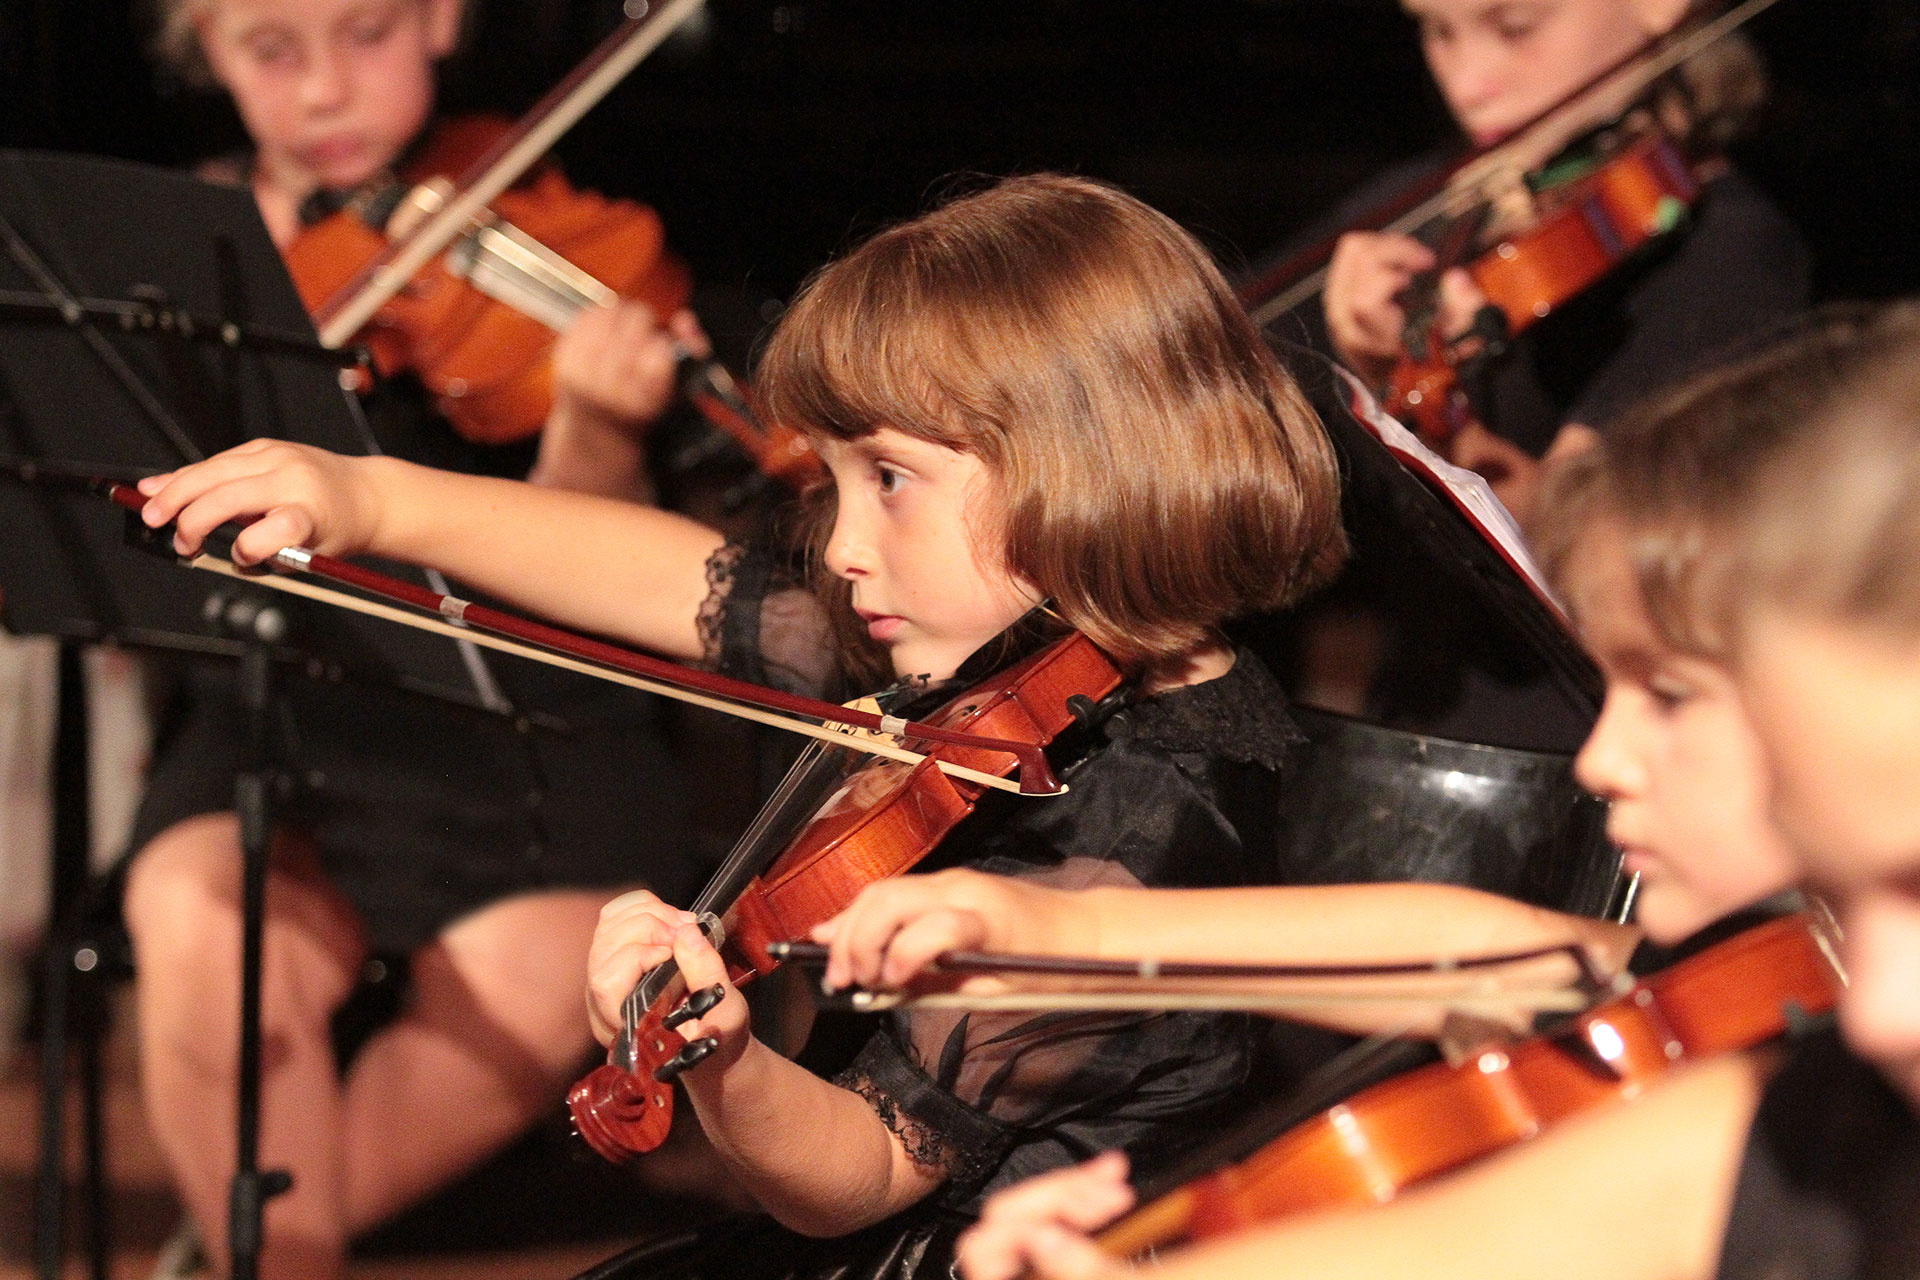 Andreia Horta A Cura junior masterclass – narnia festival